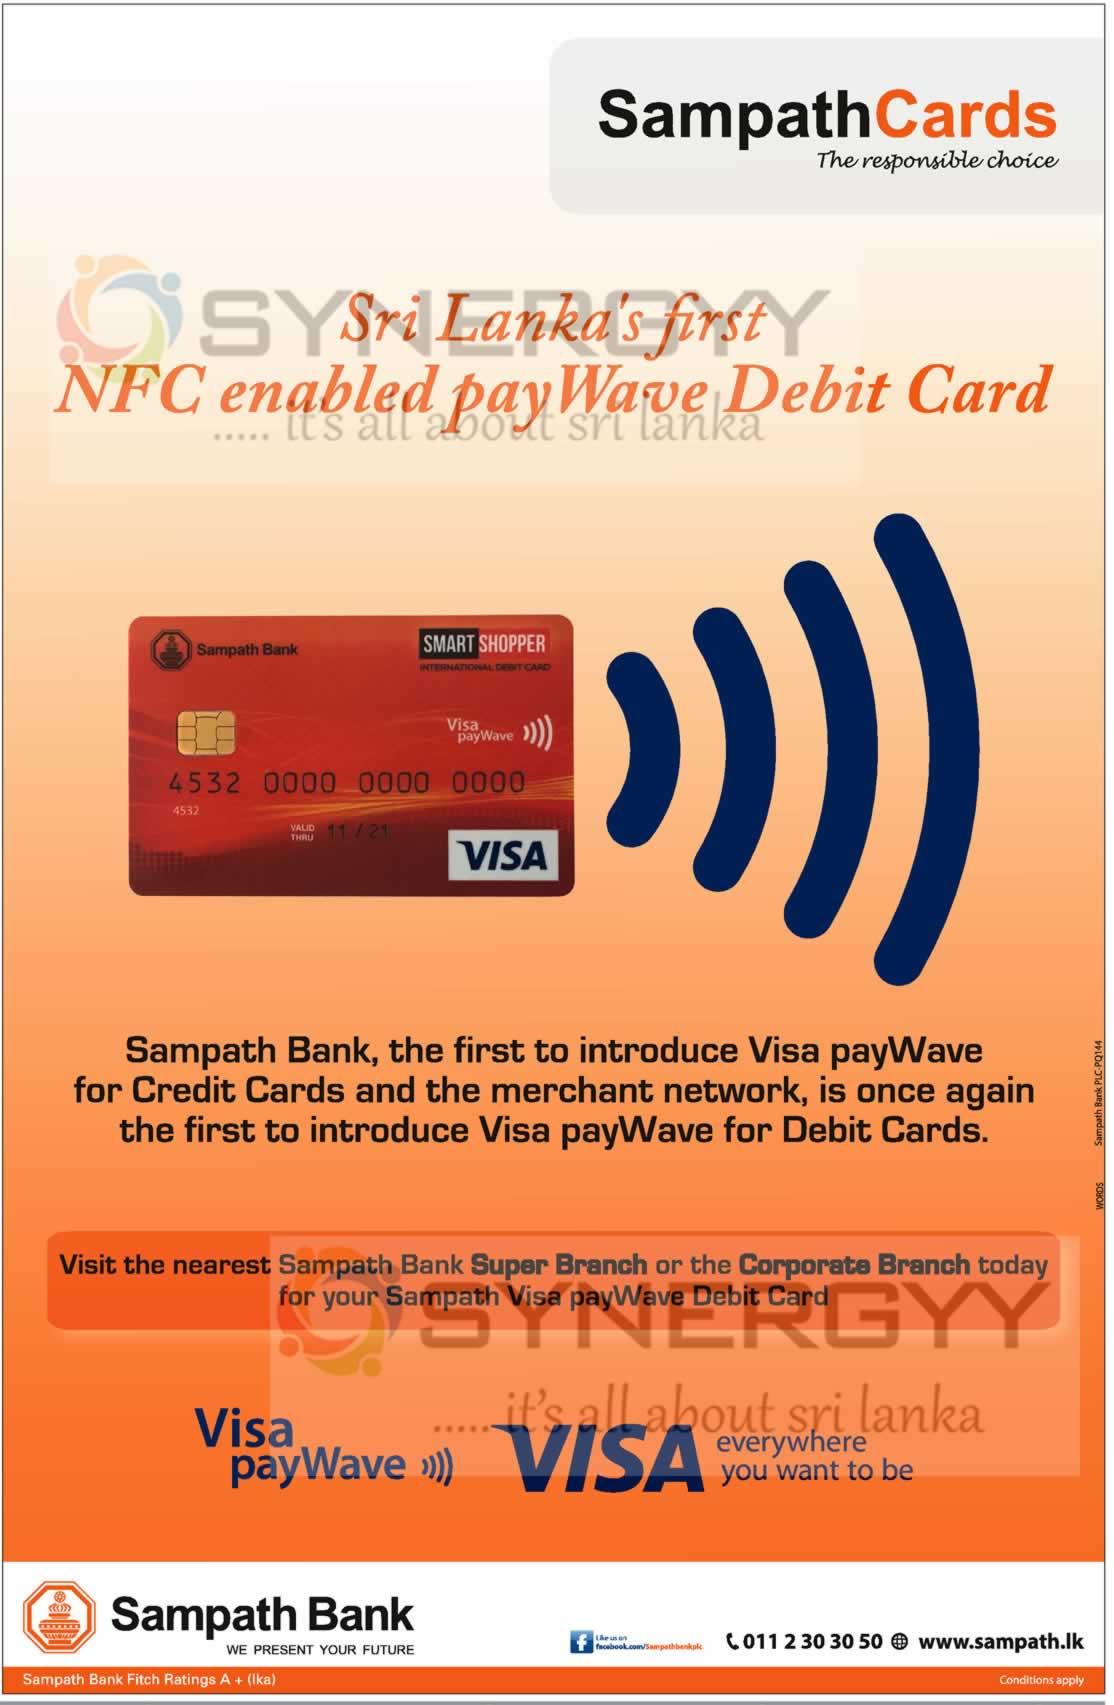 sampath-bank-visa-paywave-debit-card-only-from-sampath ...